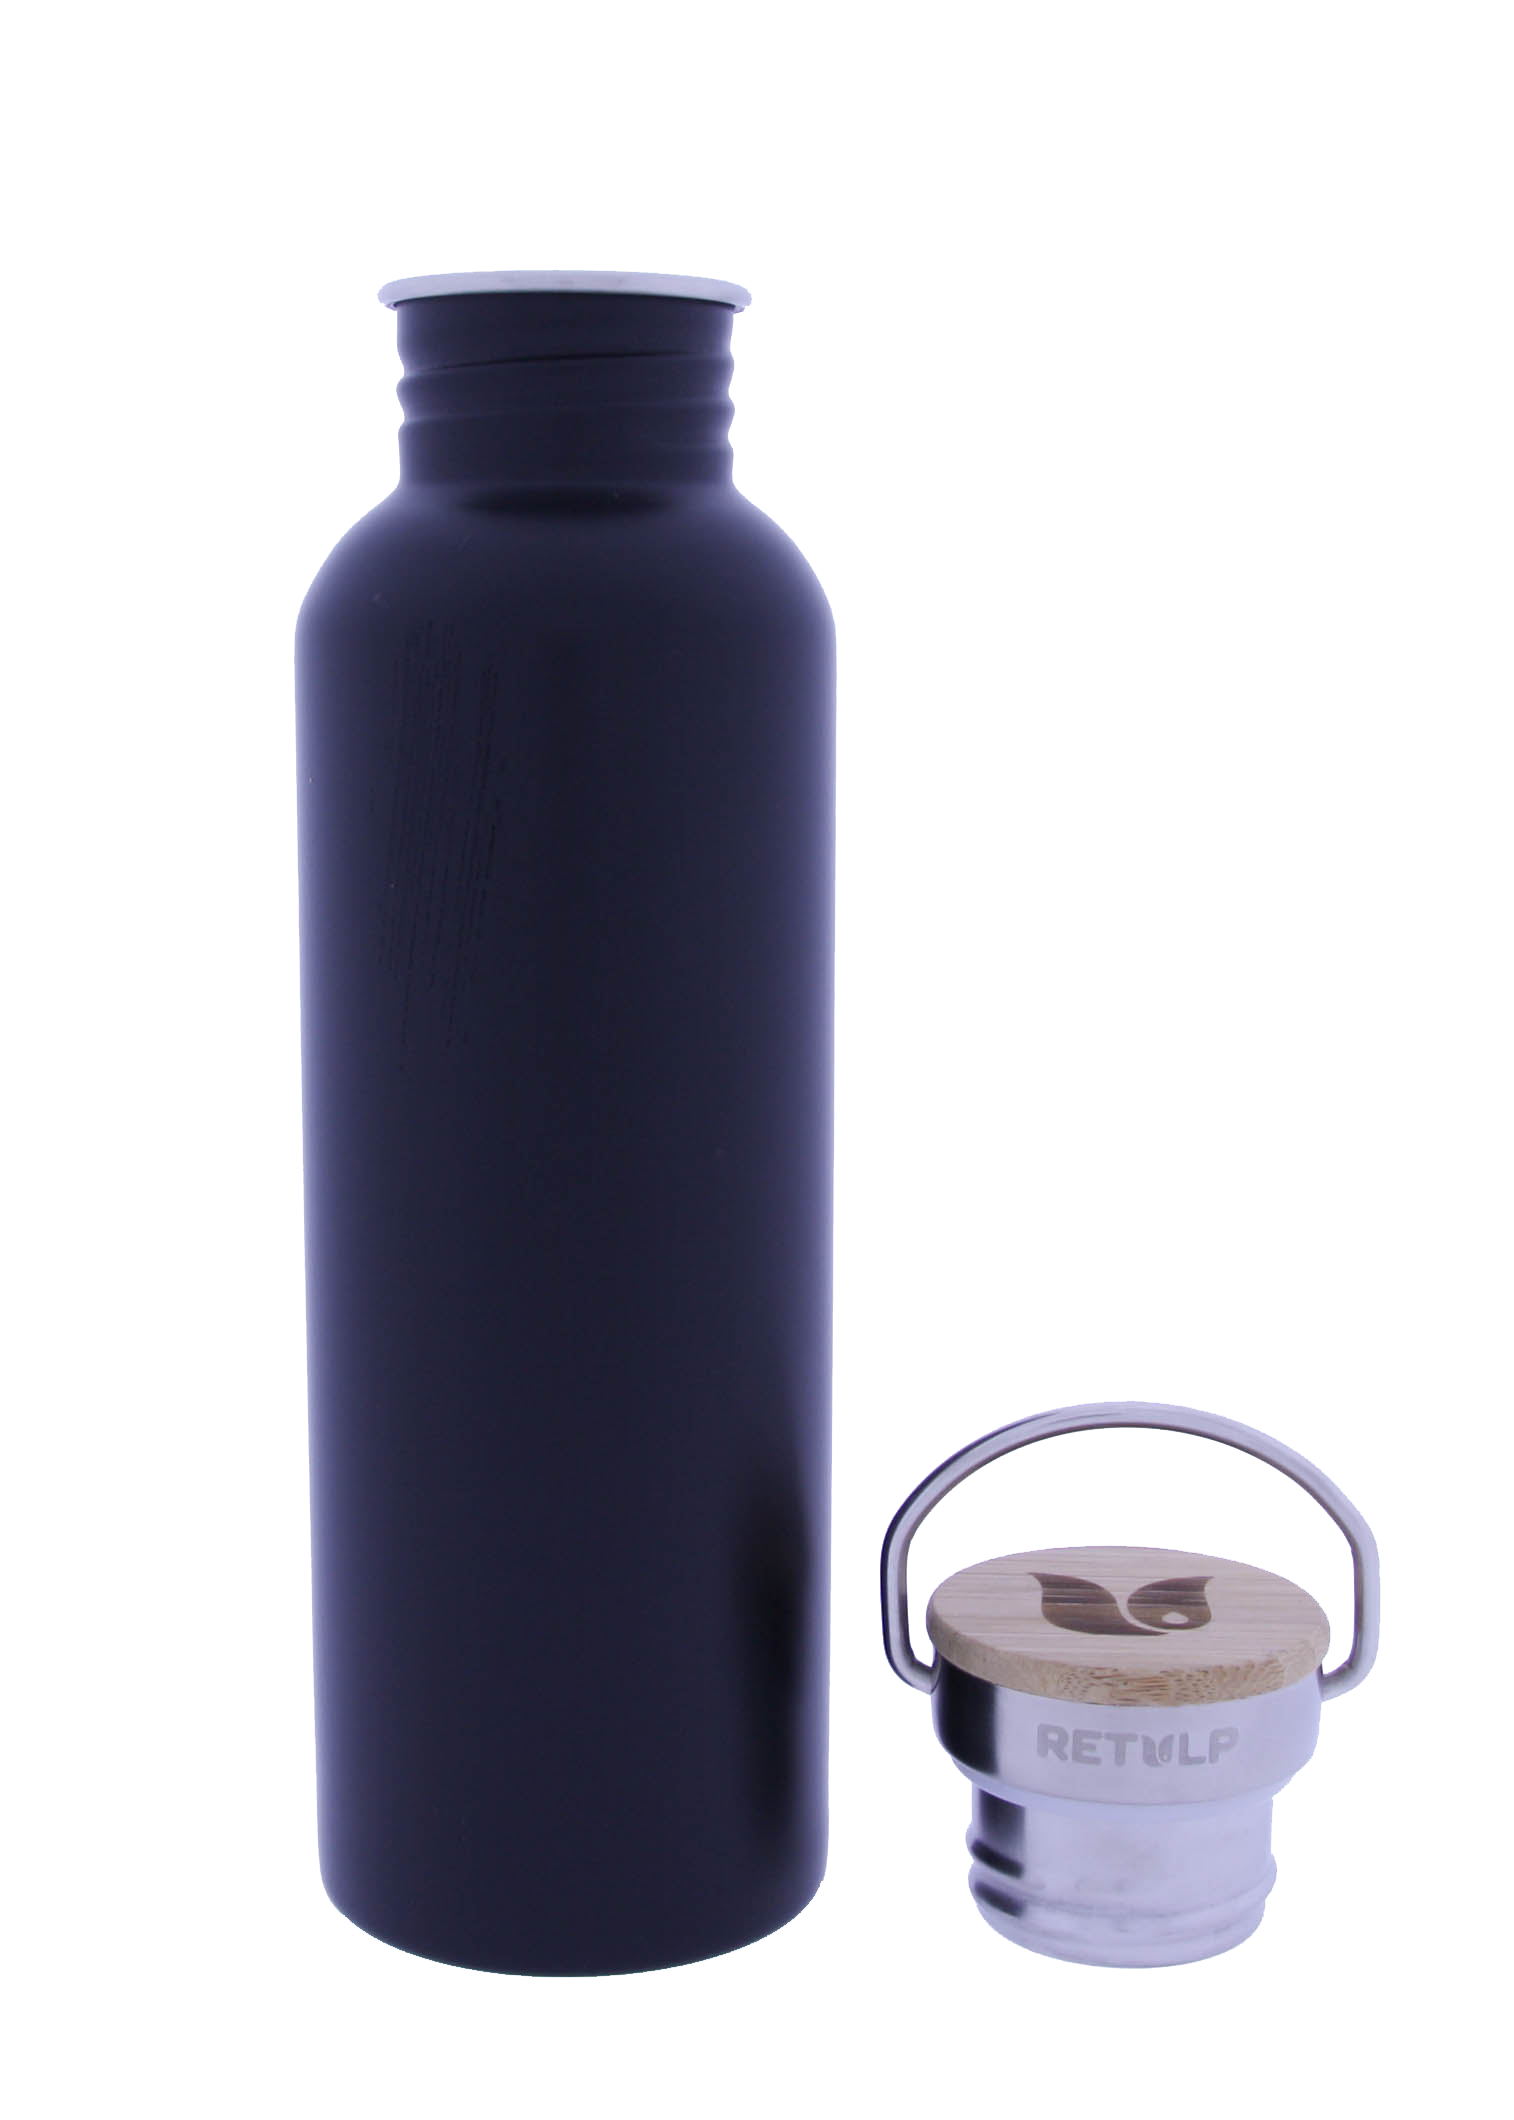 Retulp Urban Drinkfles Night Black met RVS dop 750 ml